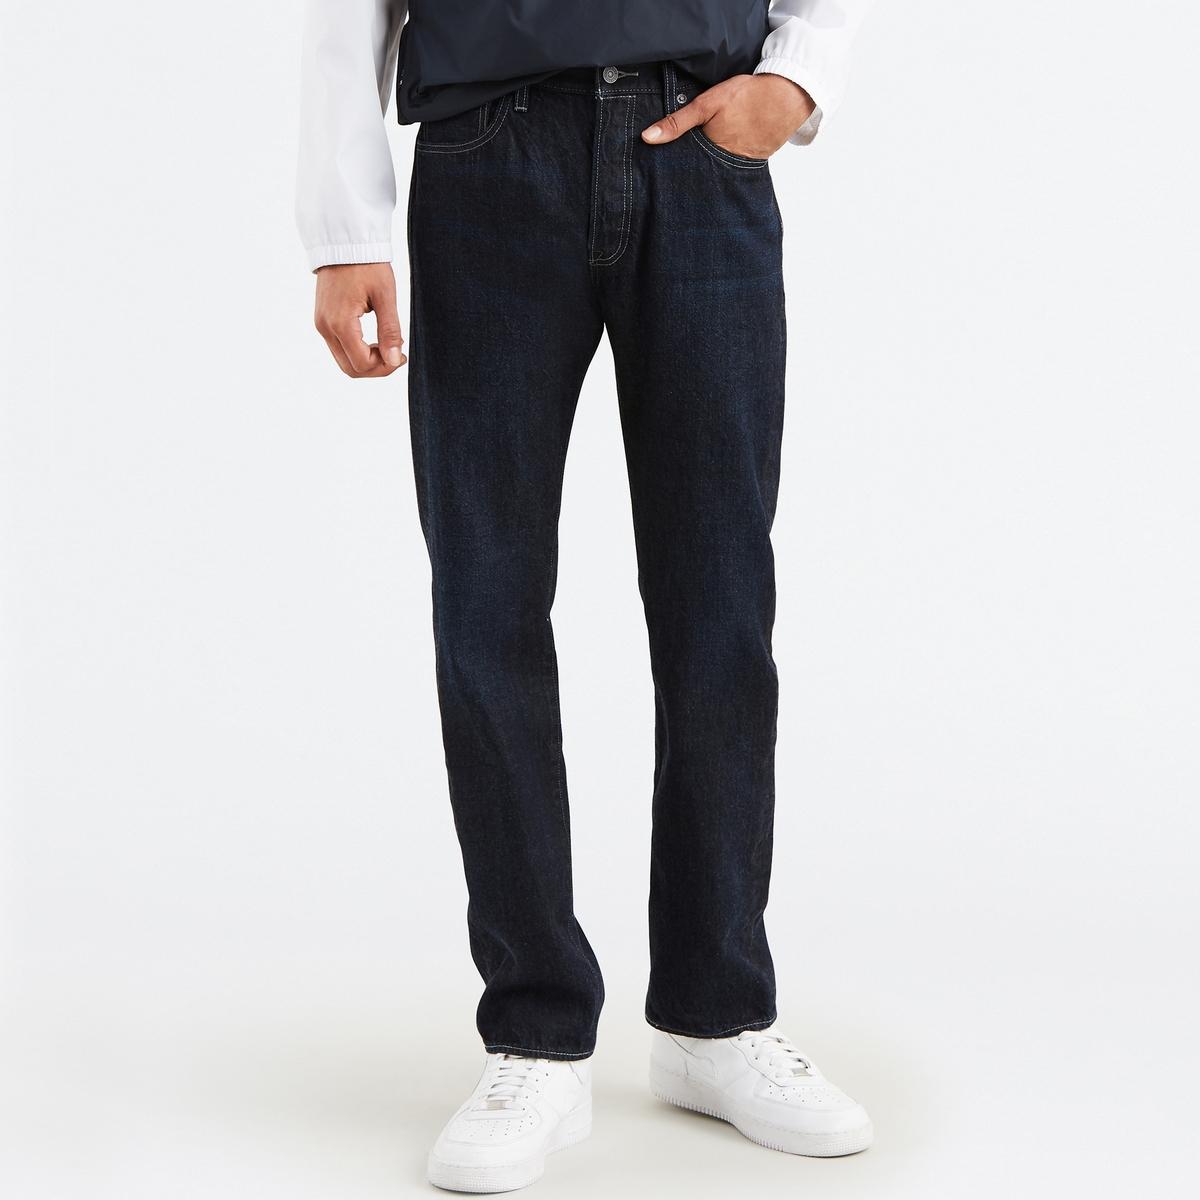 Jeans 501 regular, corte direito